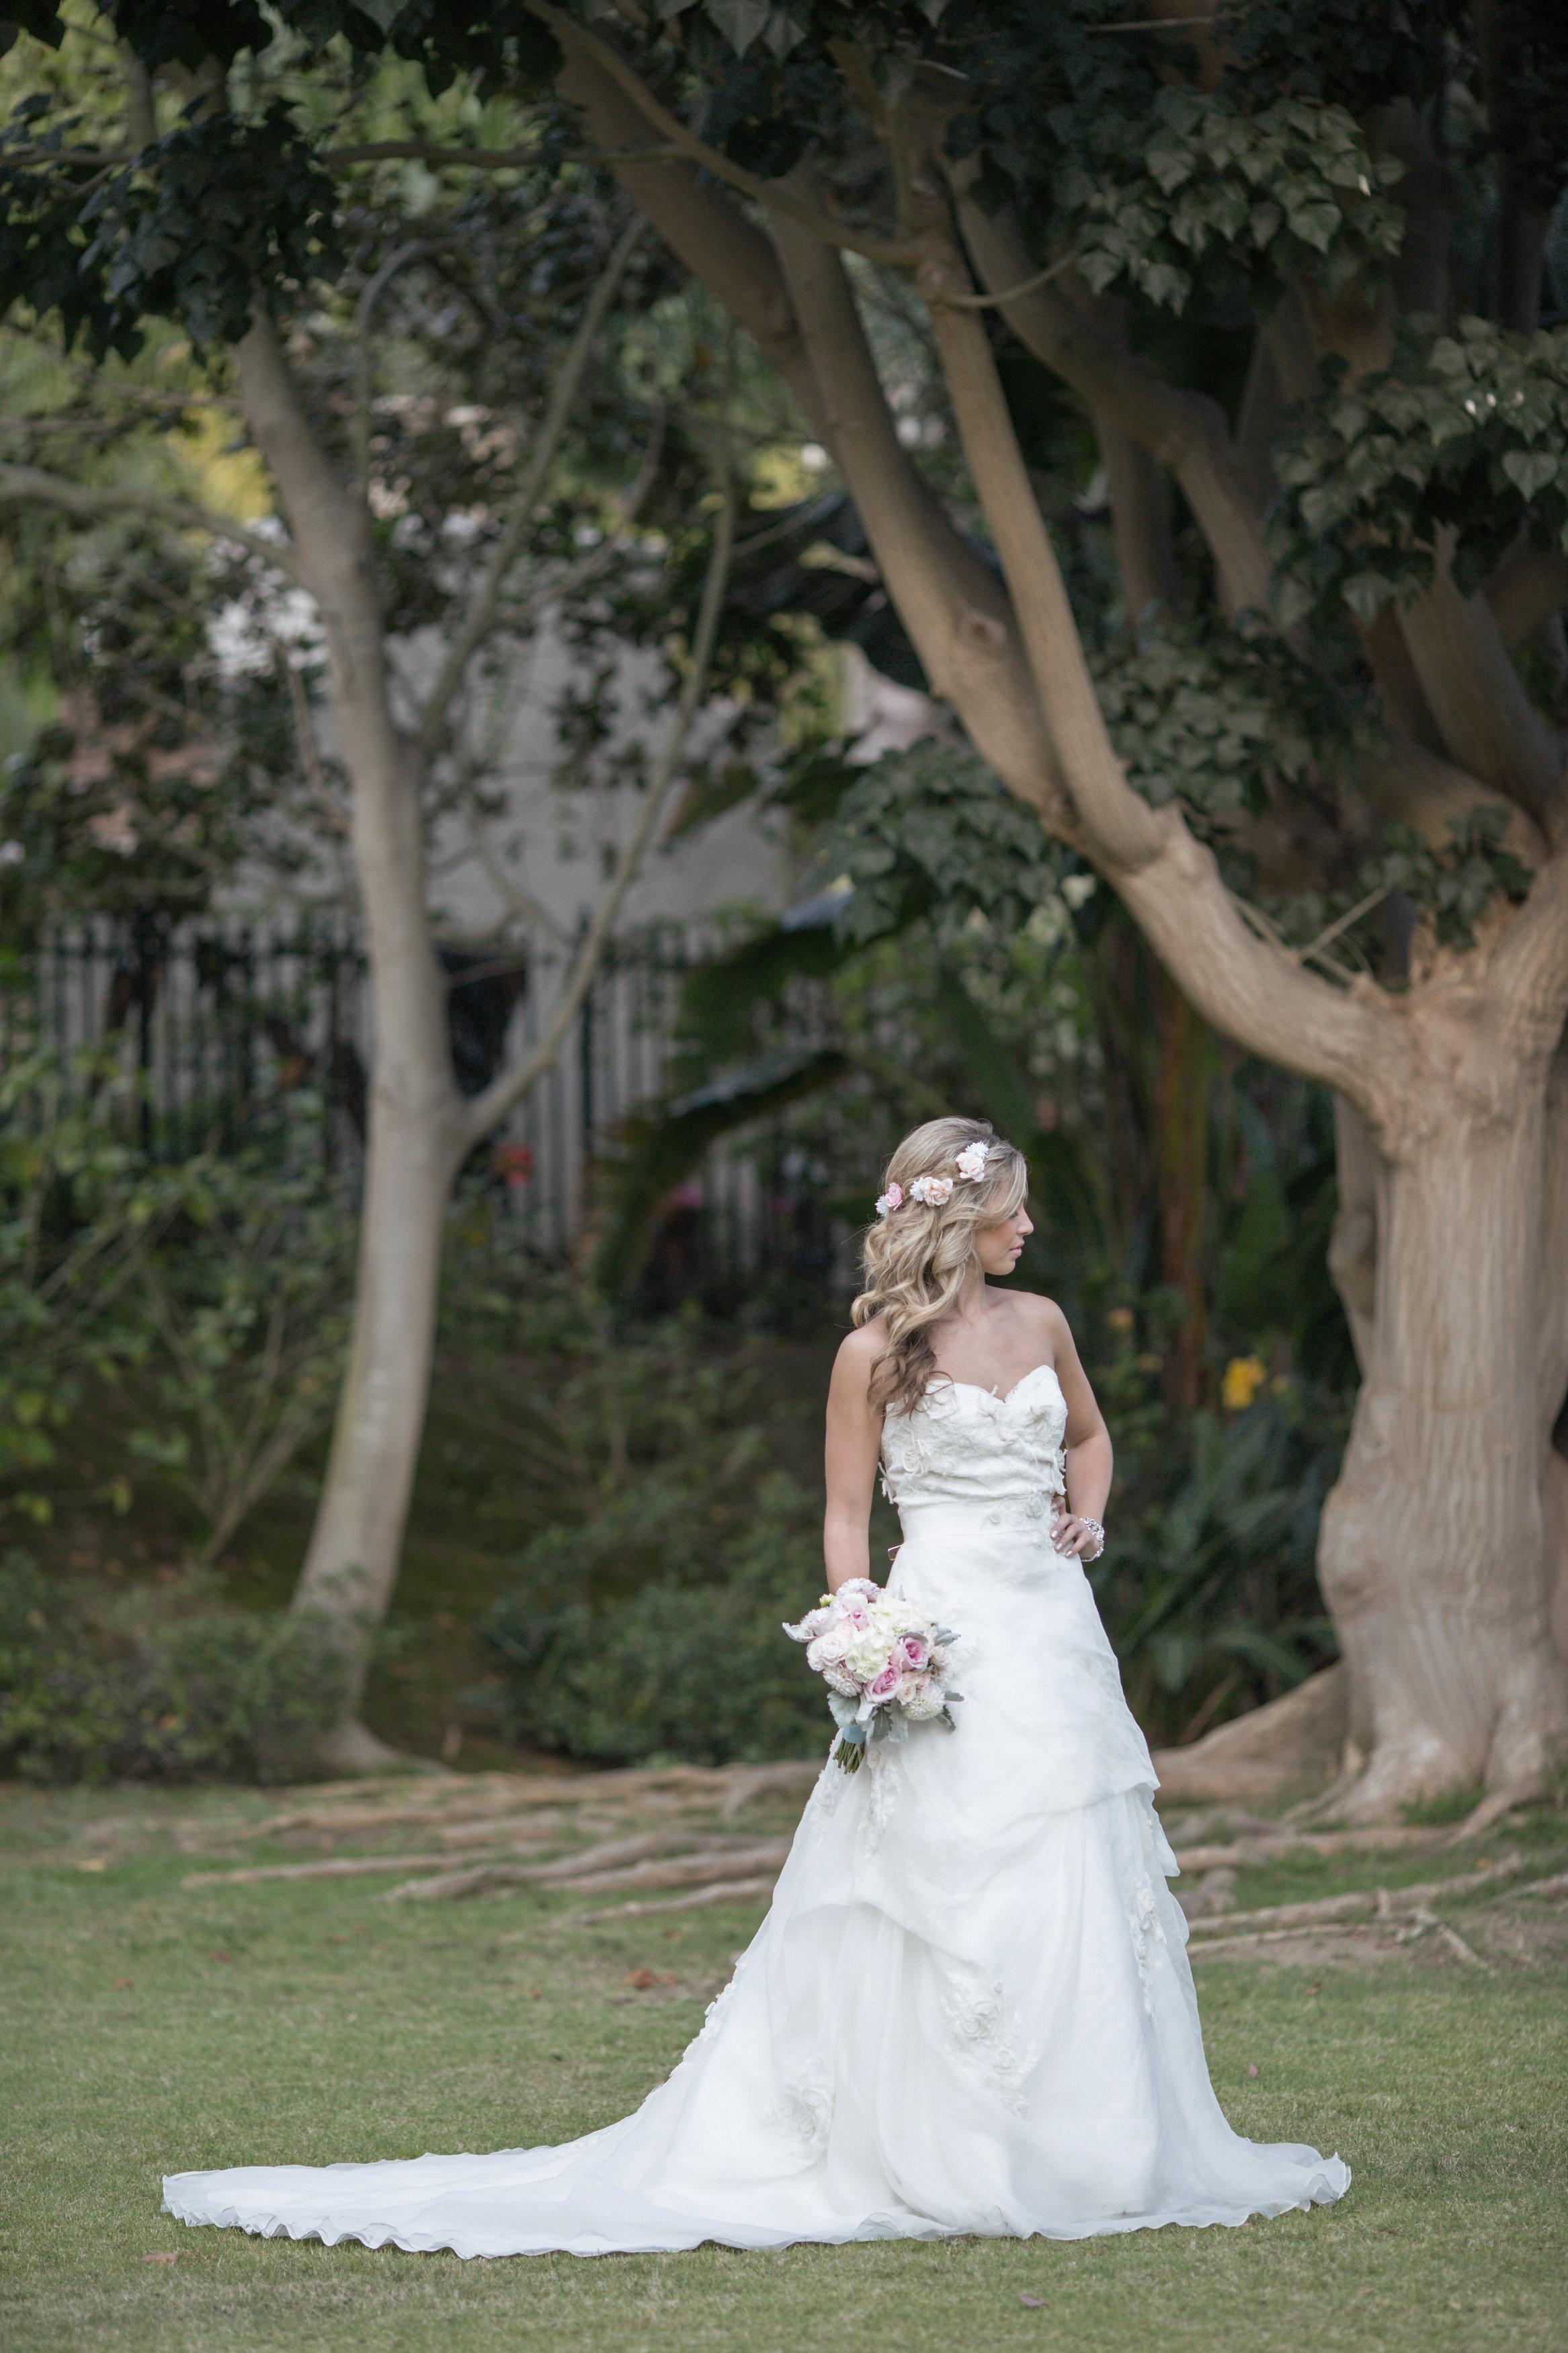 David Manning Photographer Morgan Leigh Boberg San Diego Inspiration Shoot